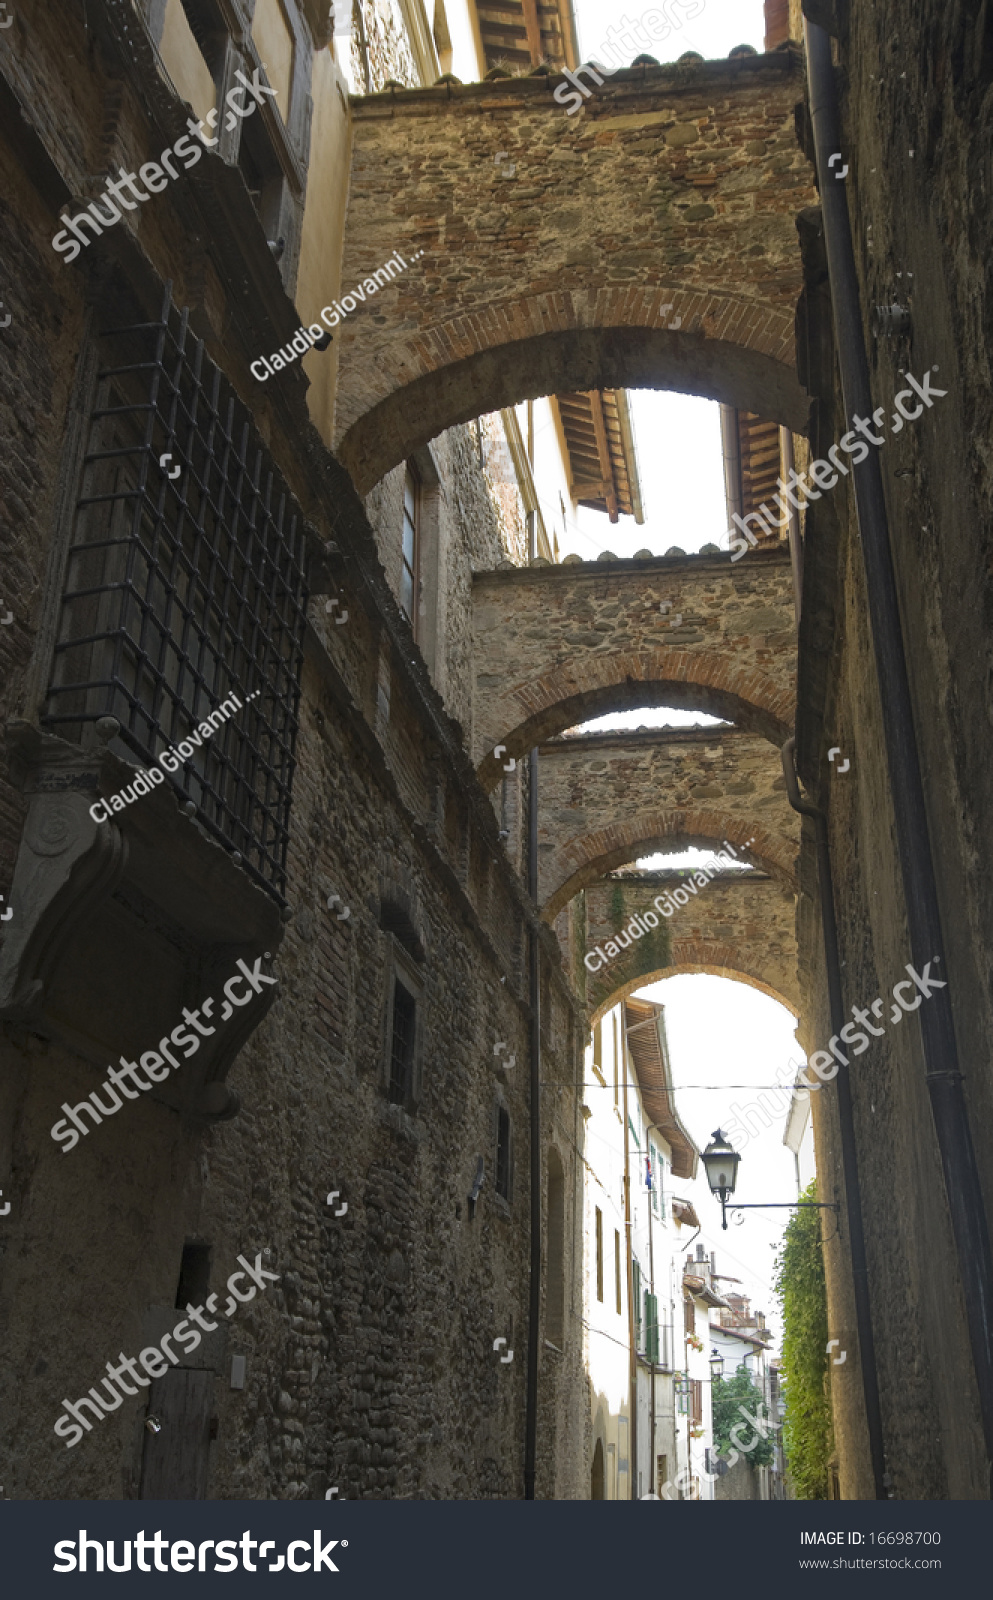 Sansepolcro Italy  city photos gallery : Sansepolcro Arezzo, Tuscany, Italy Old Street With Arches Stock ...